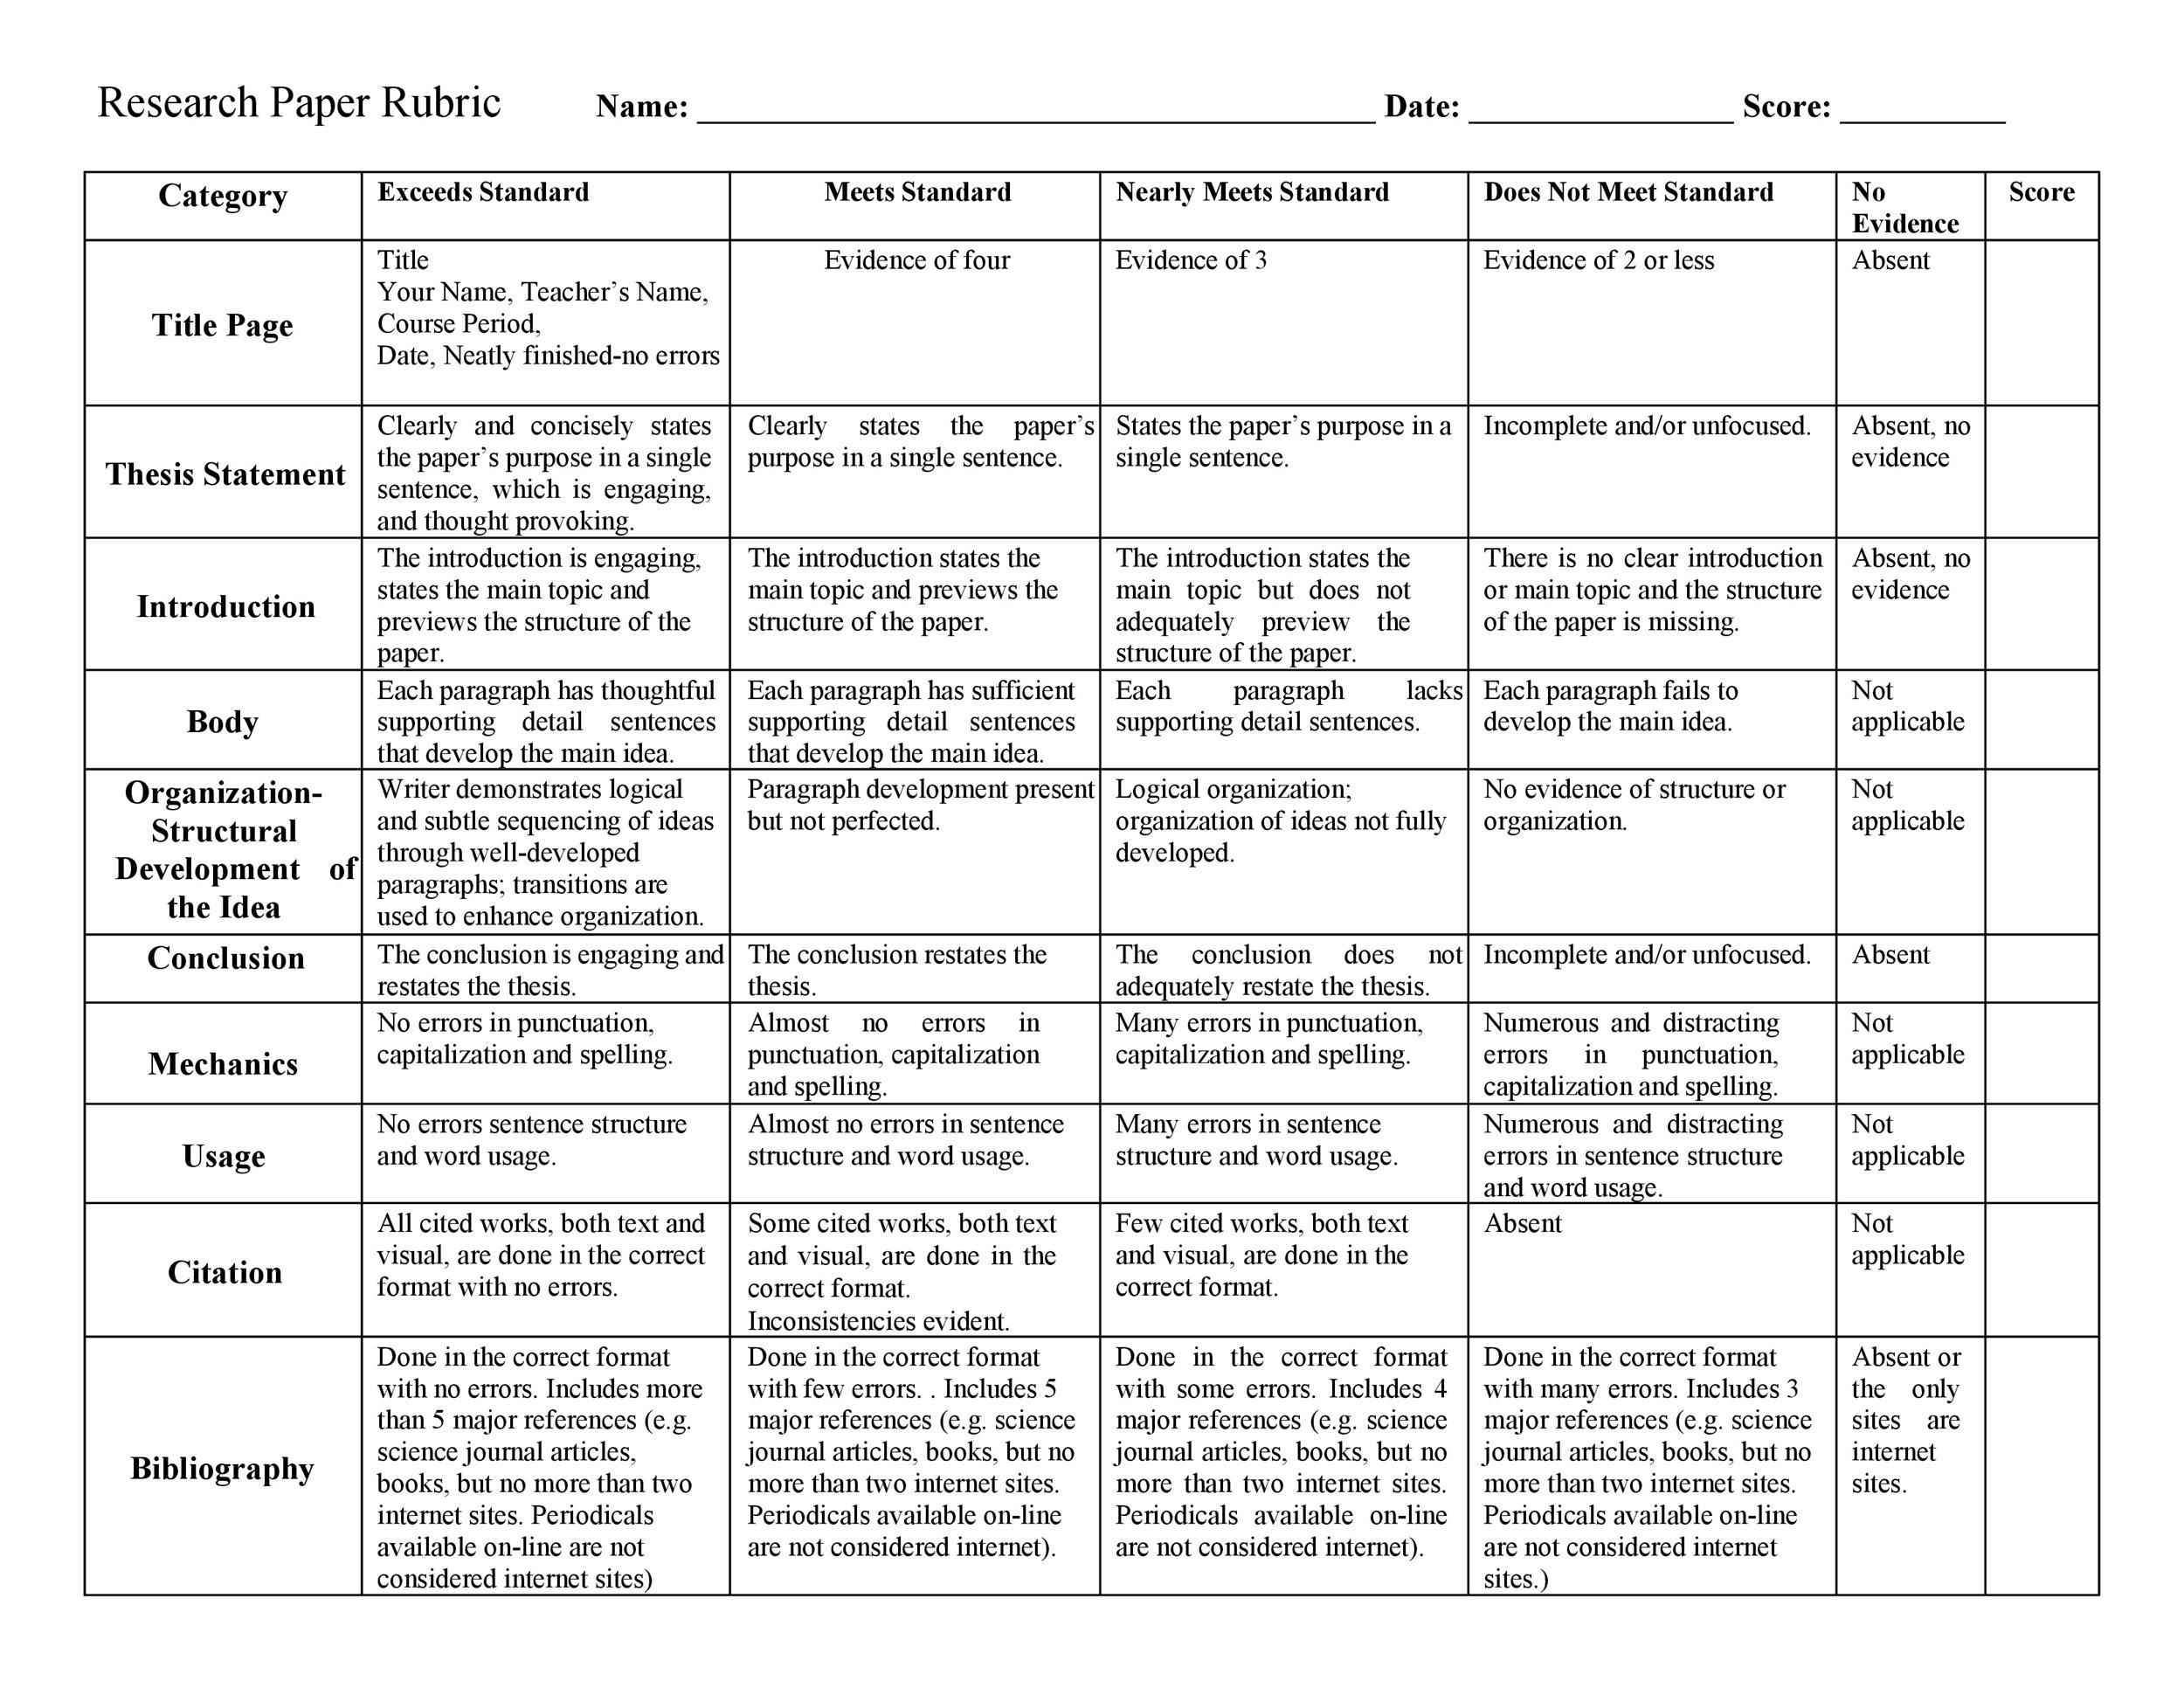 Essay scoring rubric template for colleg